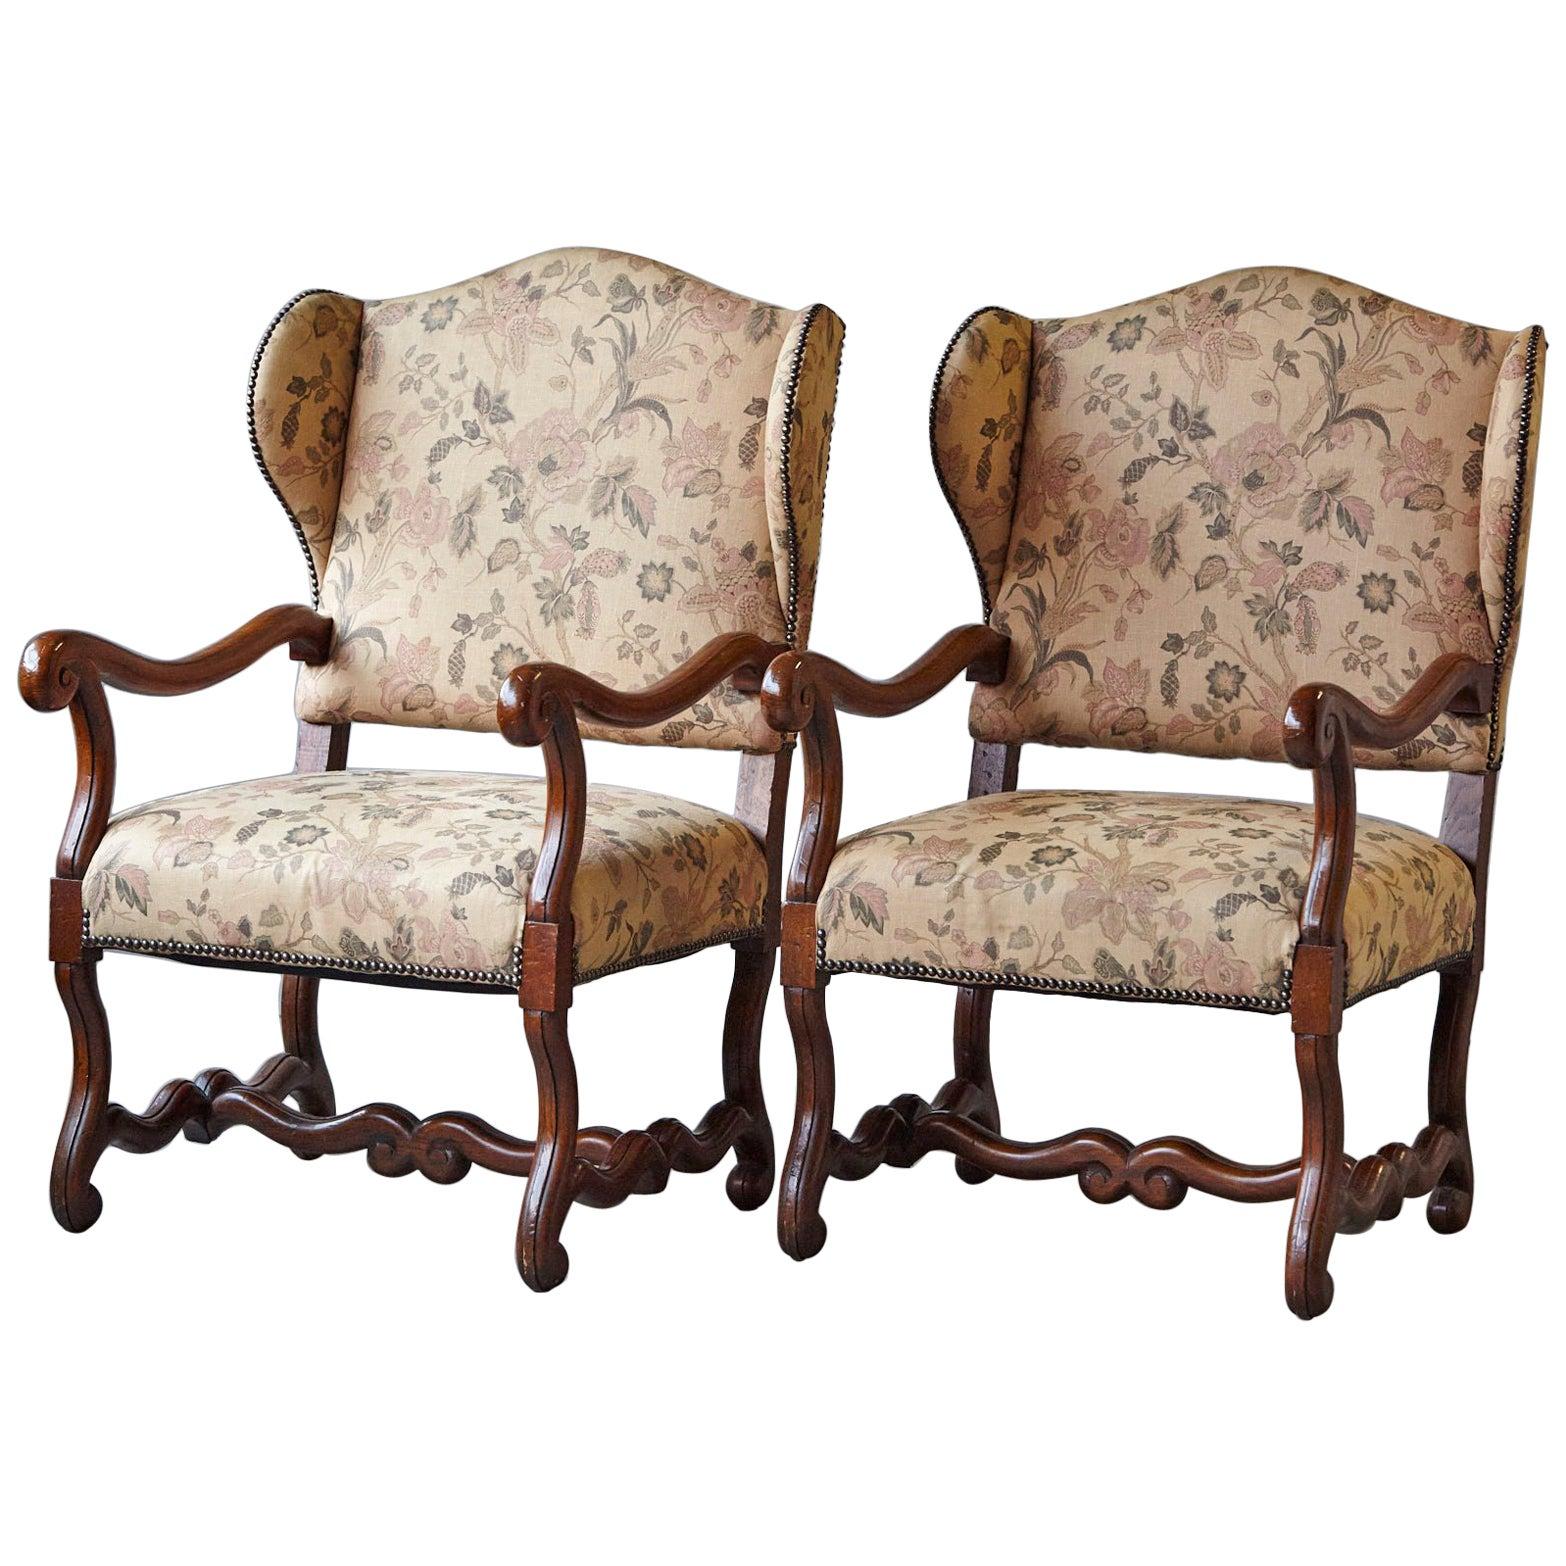 Pair of Louis XIV Style, Os de Mouton, Walnut Wingback Fauteuils